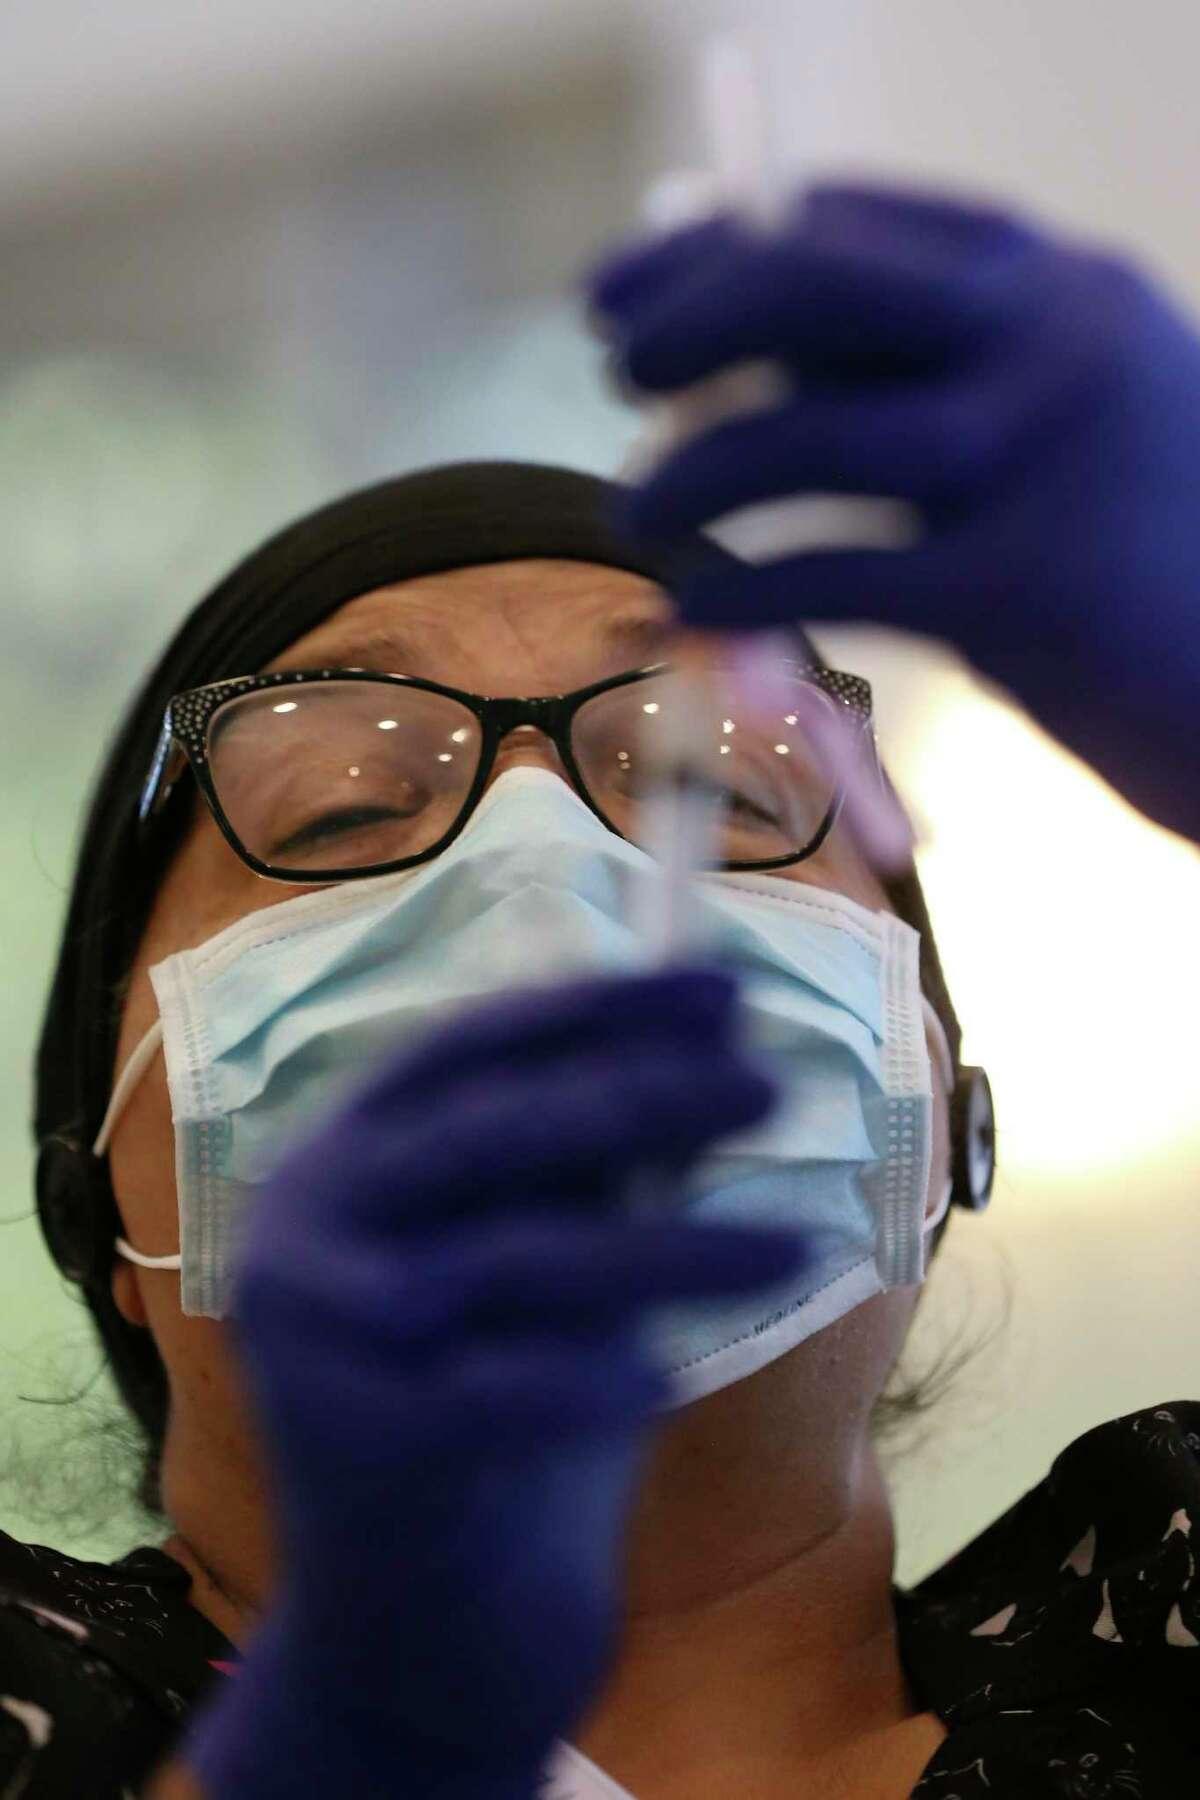 Mirta Martinez measures a dose of the Moderna COVID-19 vaccine.